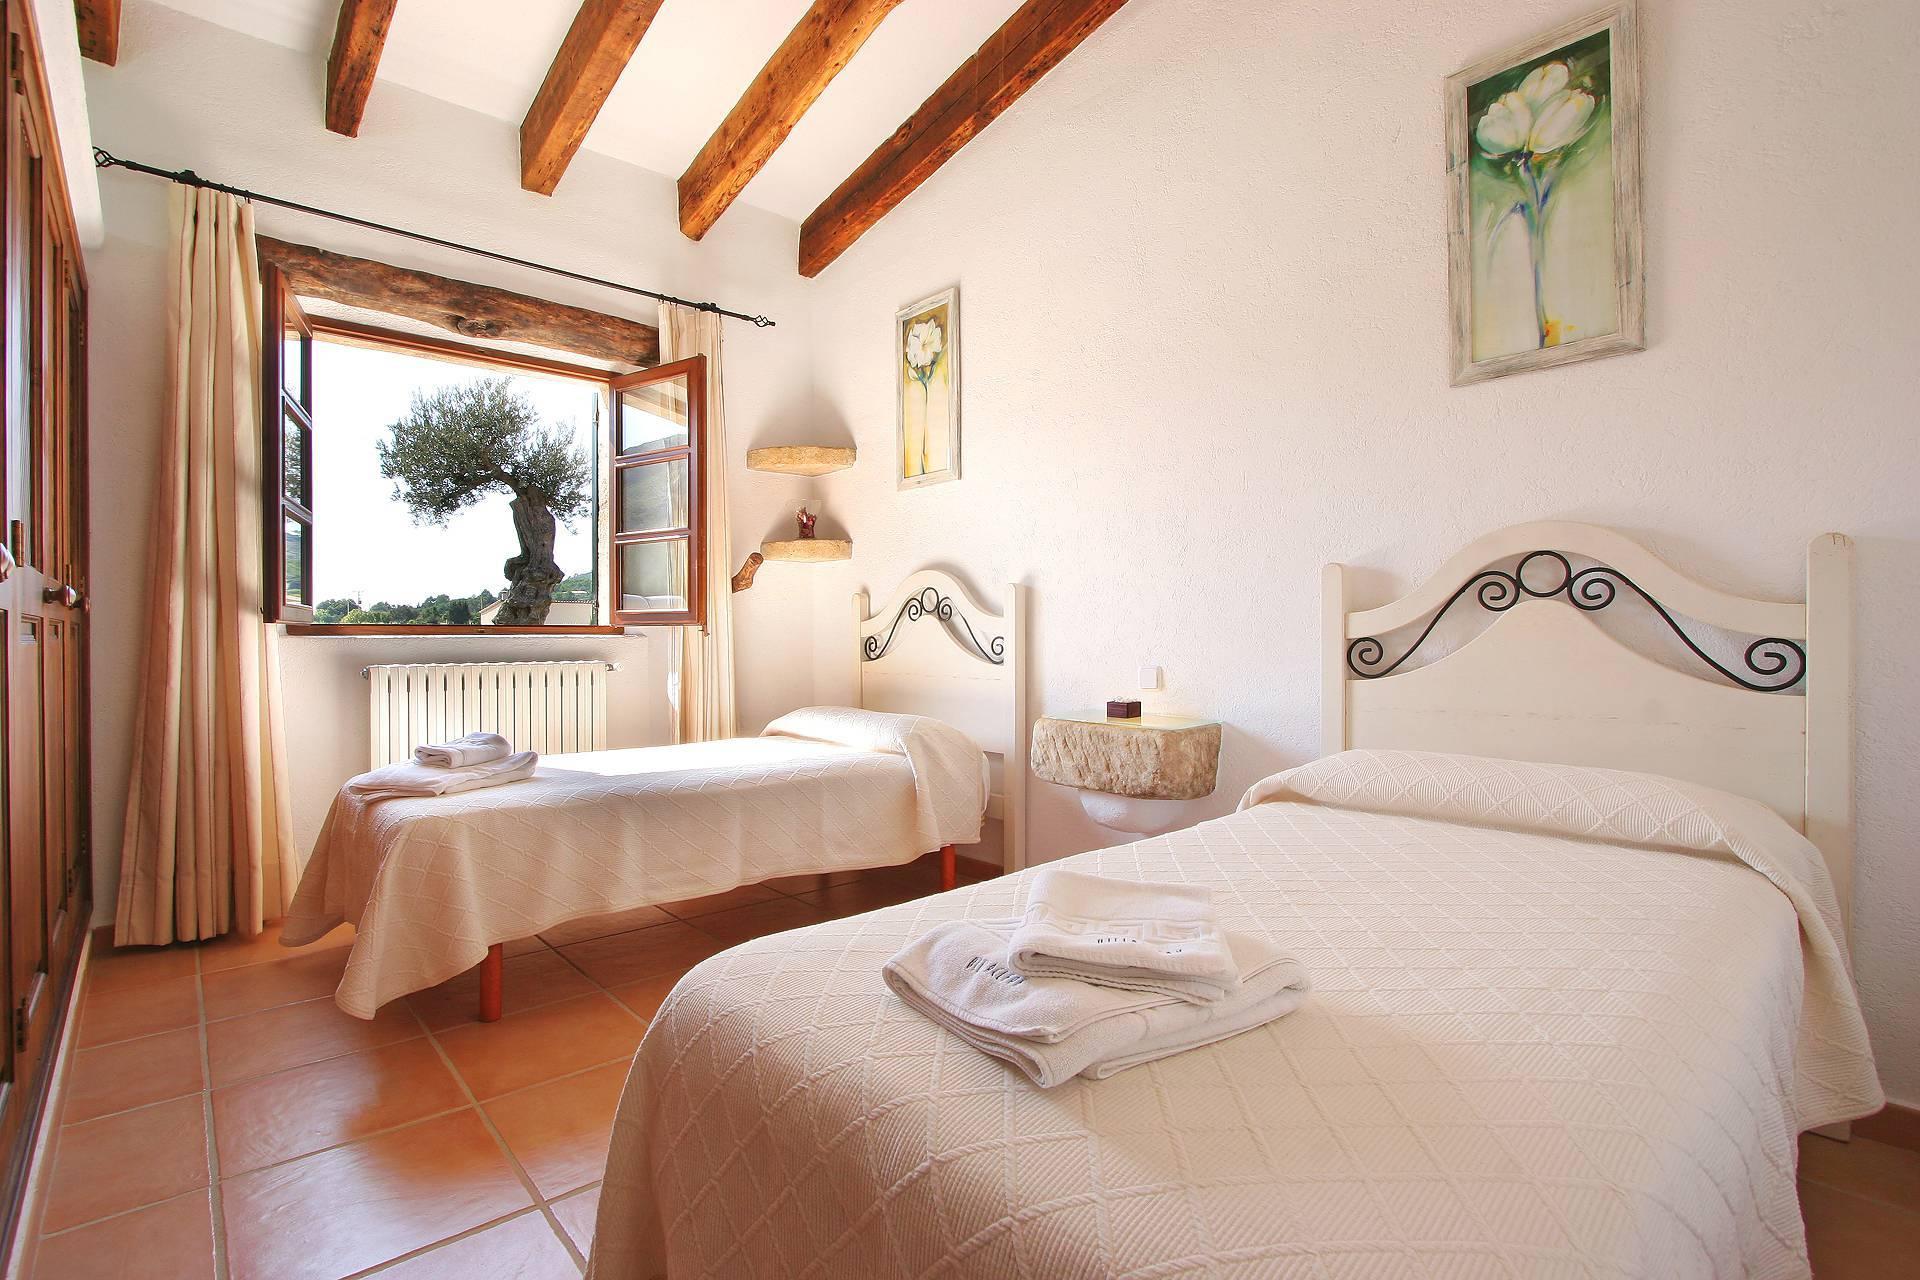 01-55 Familienfreundliche Finca Mallorca Norden Bild 16